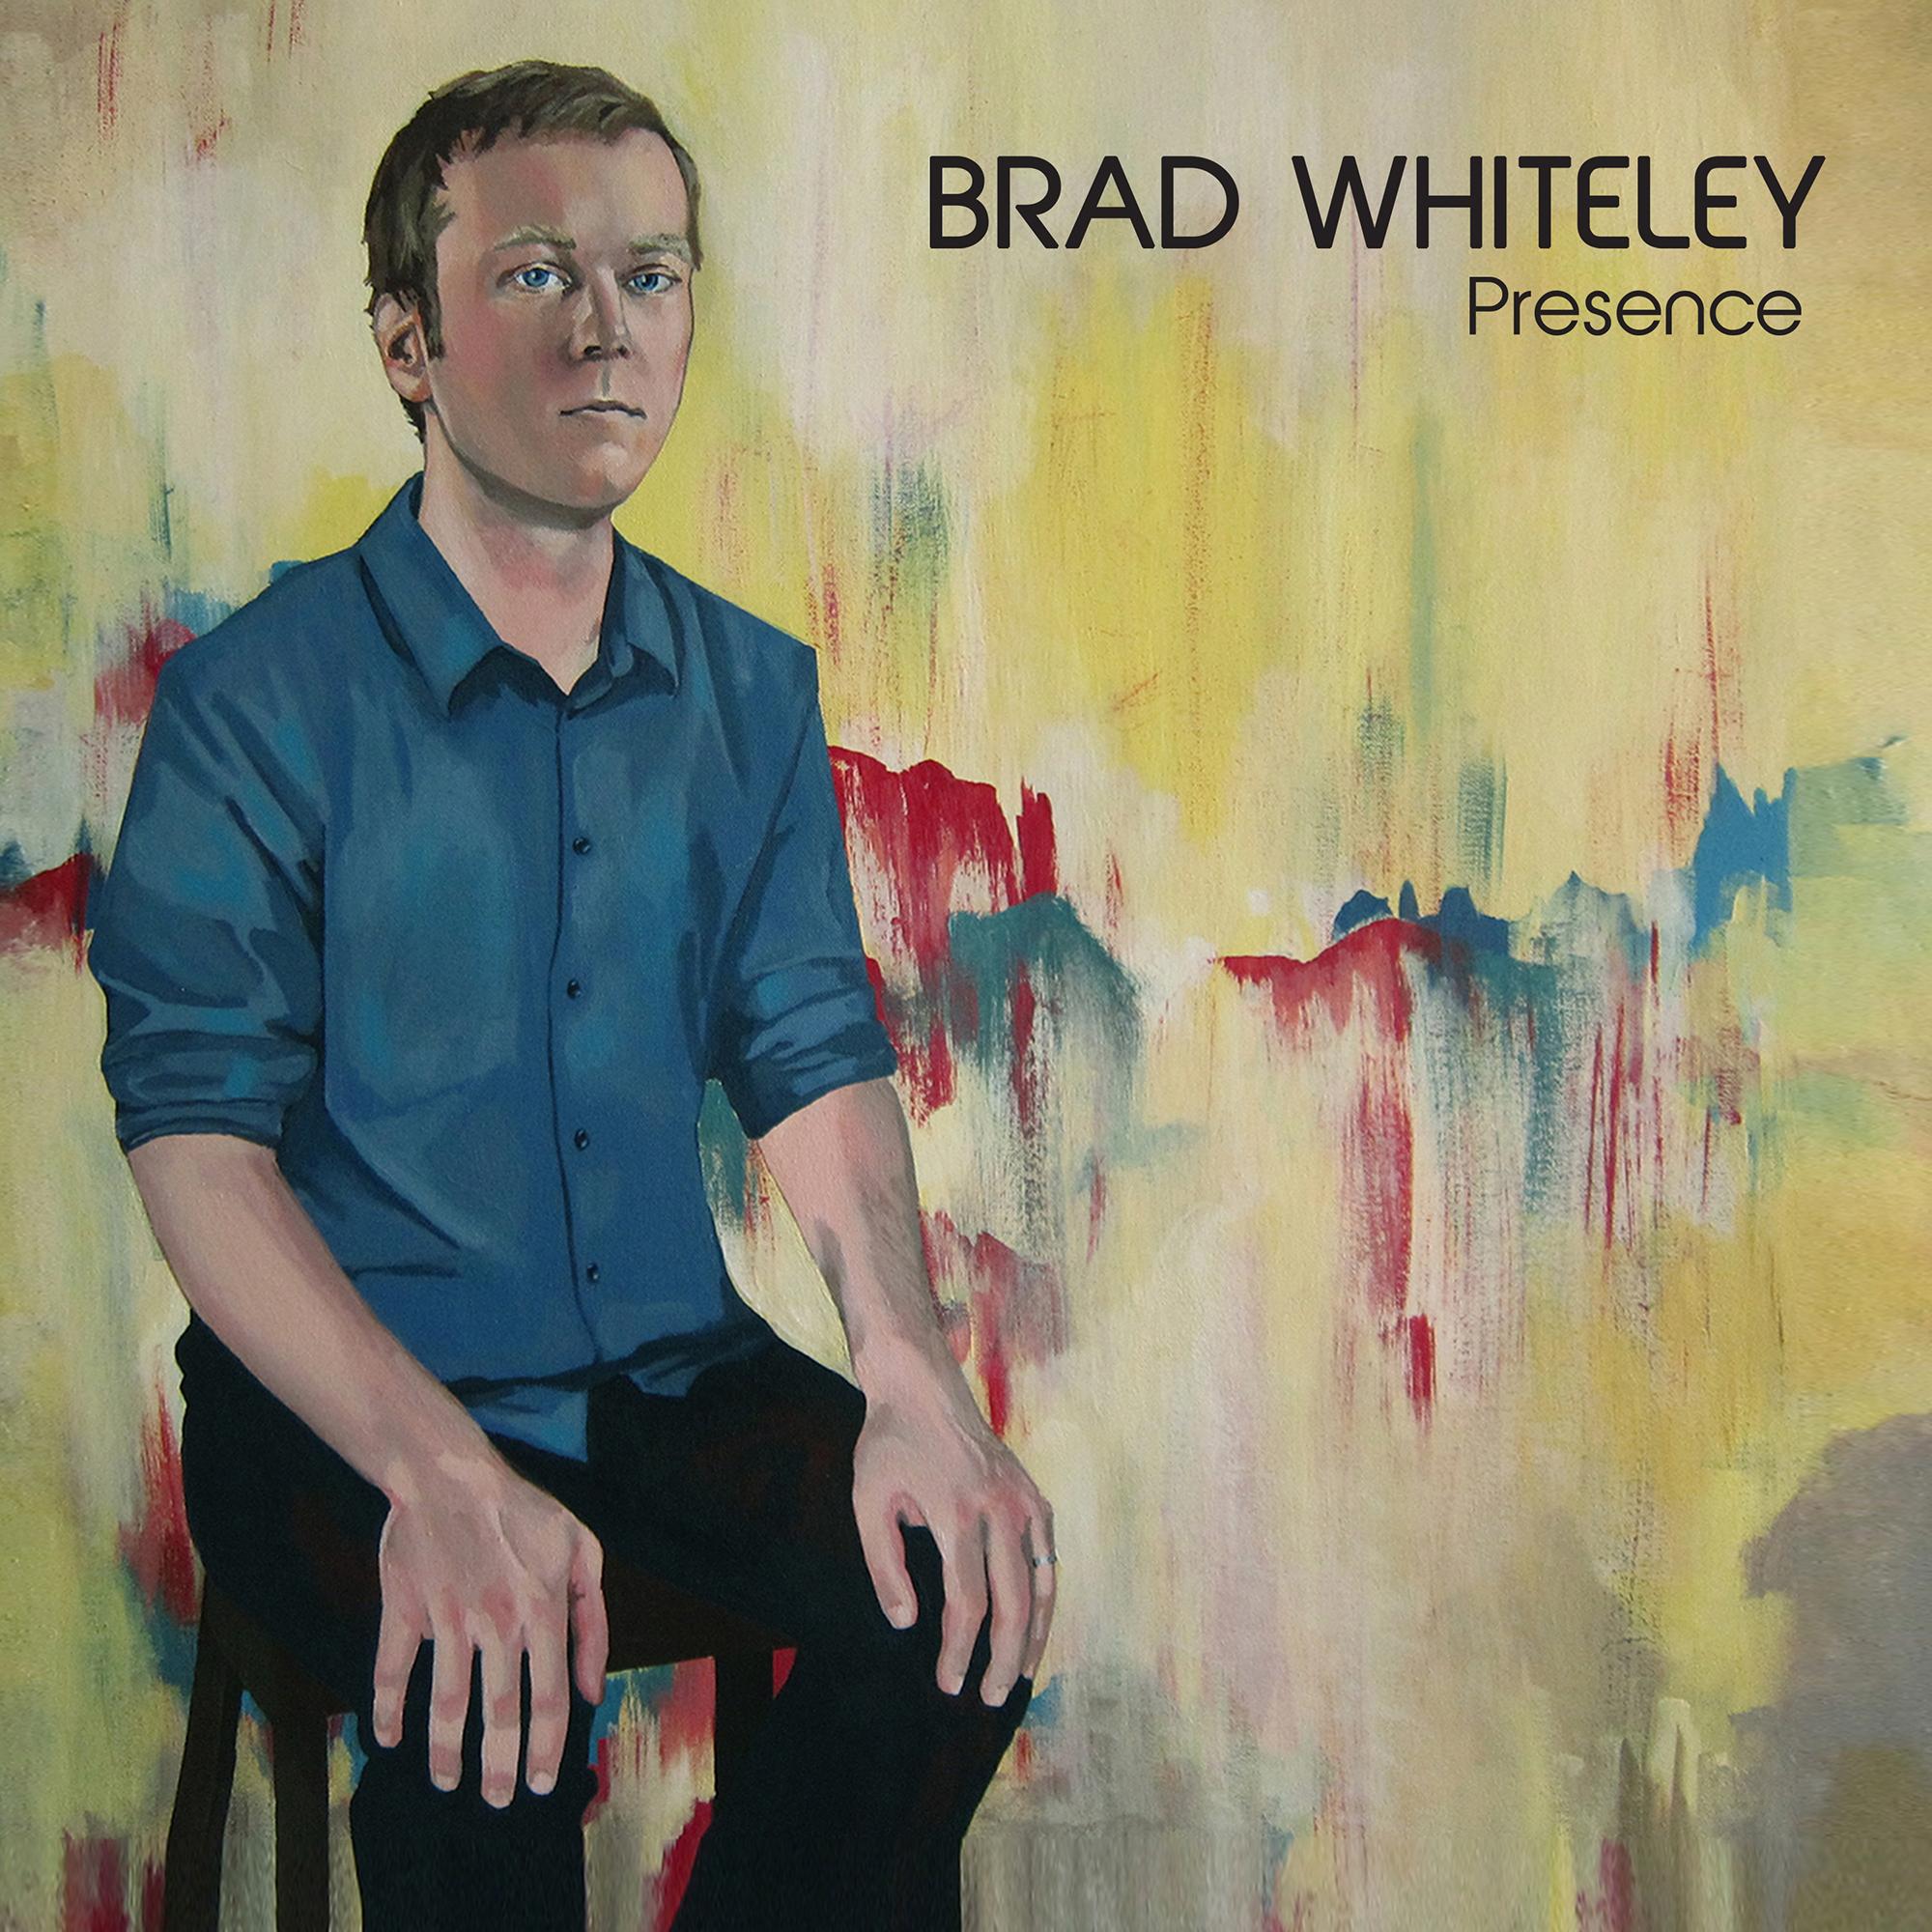 Presence Cover.jpg